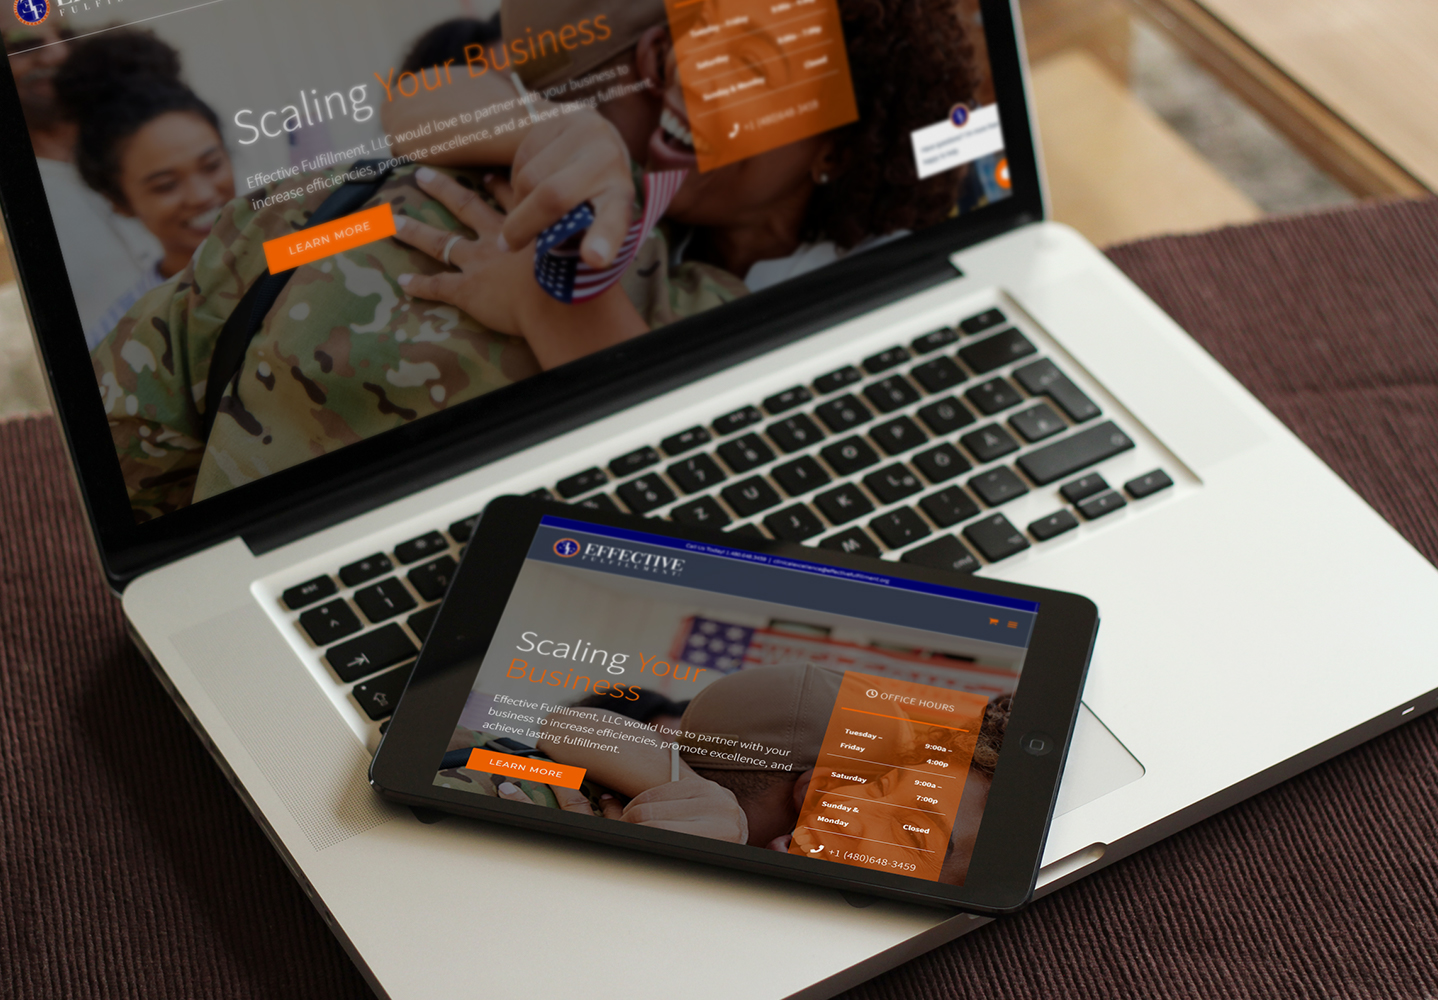 7i-effective-fulfillment-laptop-tablet